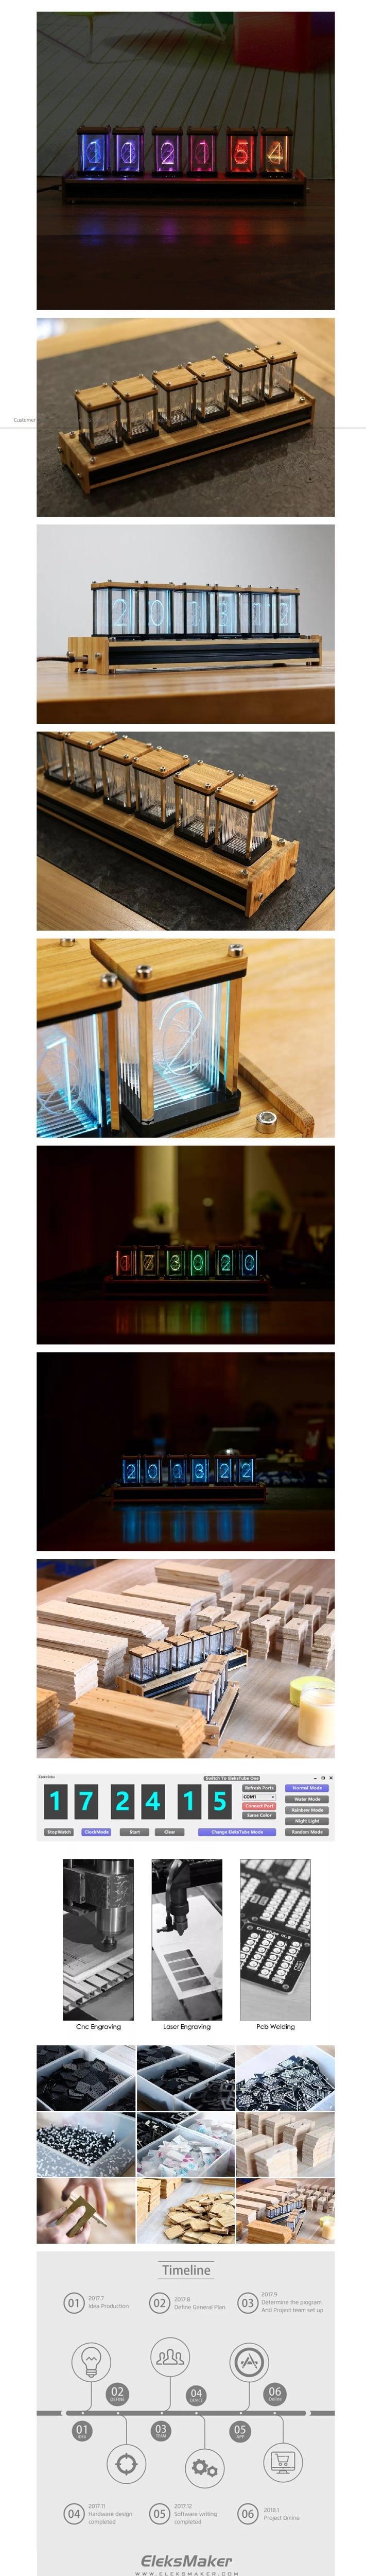 eleksmaker<ALIMT >®</ALIMT> elekstube bamboo 6-bit kit time electronic led luminous glow tube clock time flies lapse Sale - Banggood.com _ Shopping India